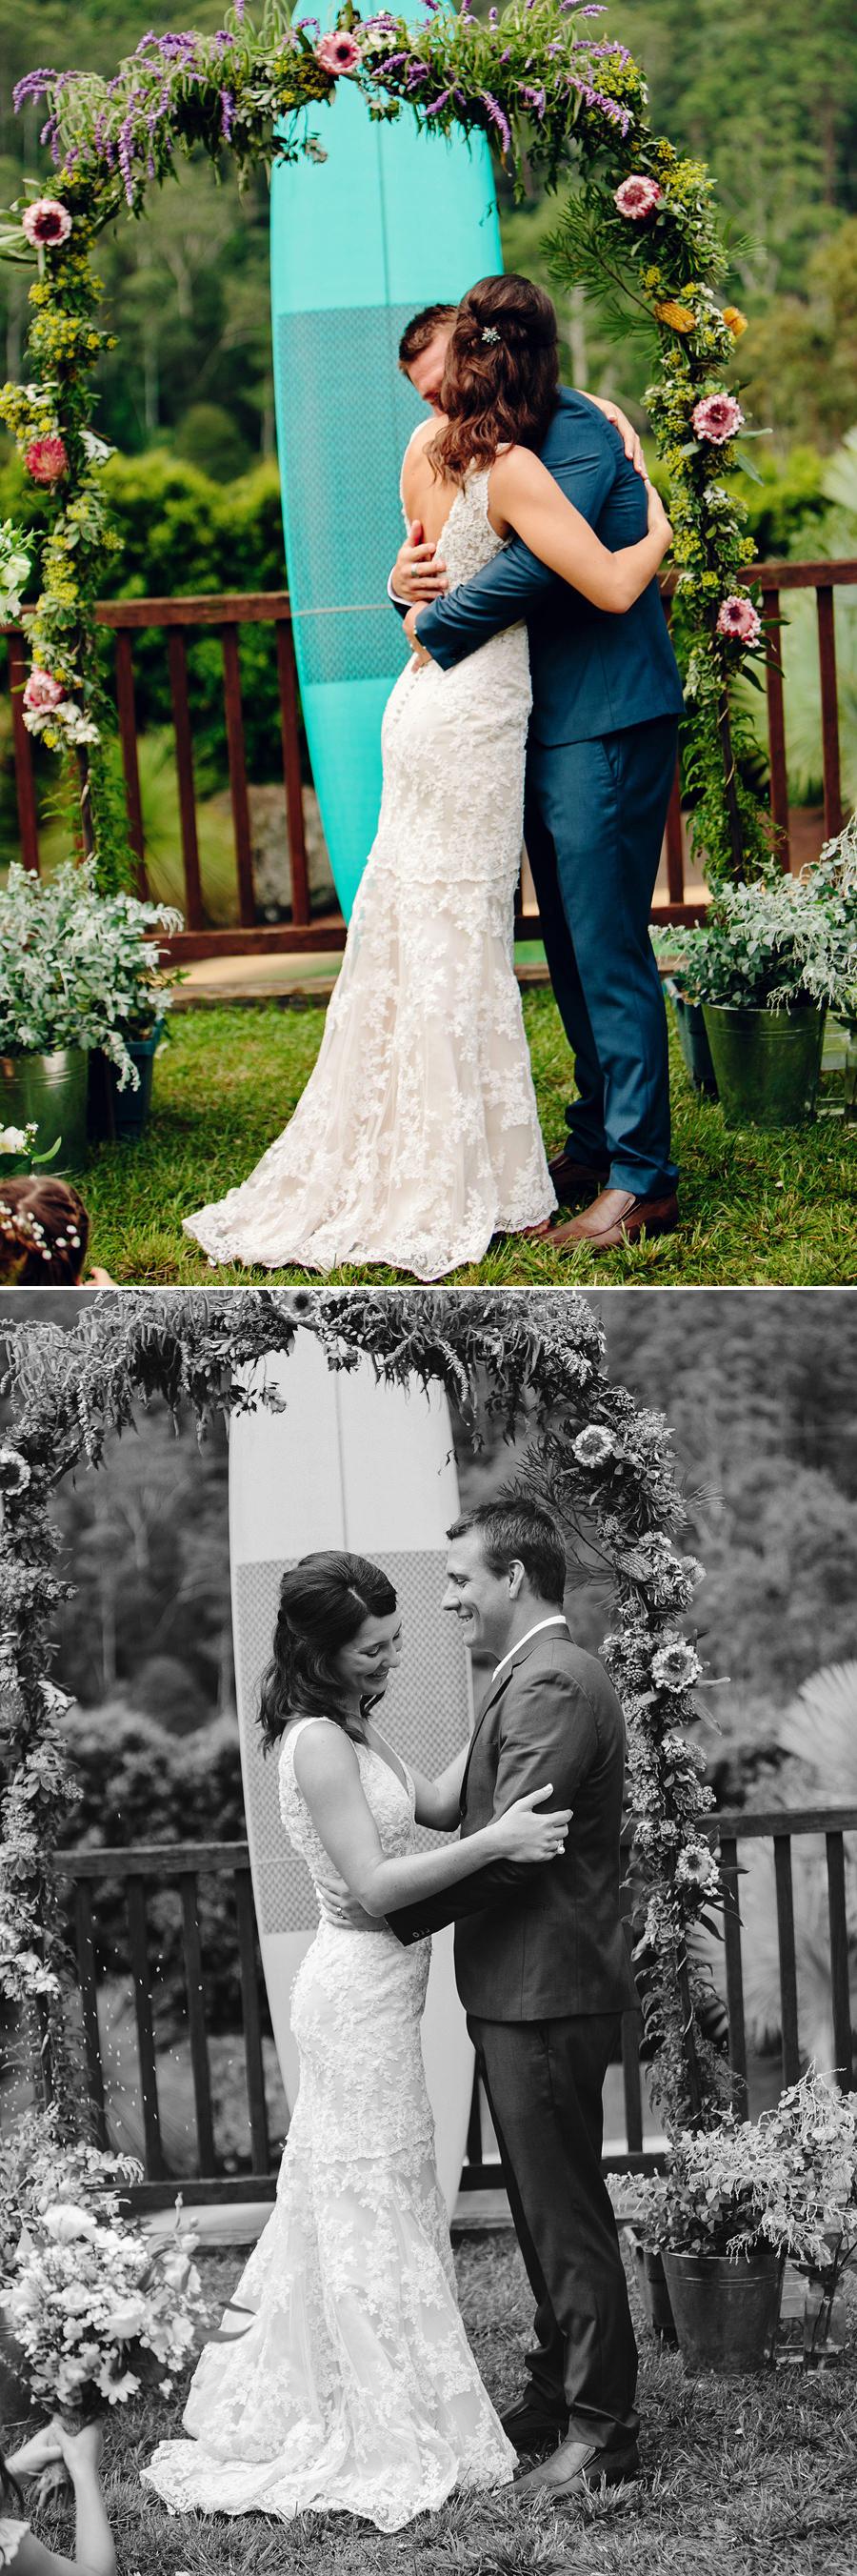 North Coast Wedding Photography: Ceremony